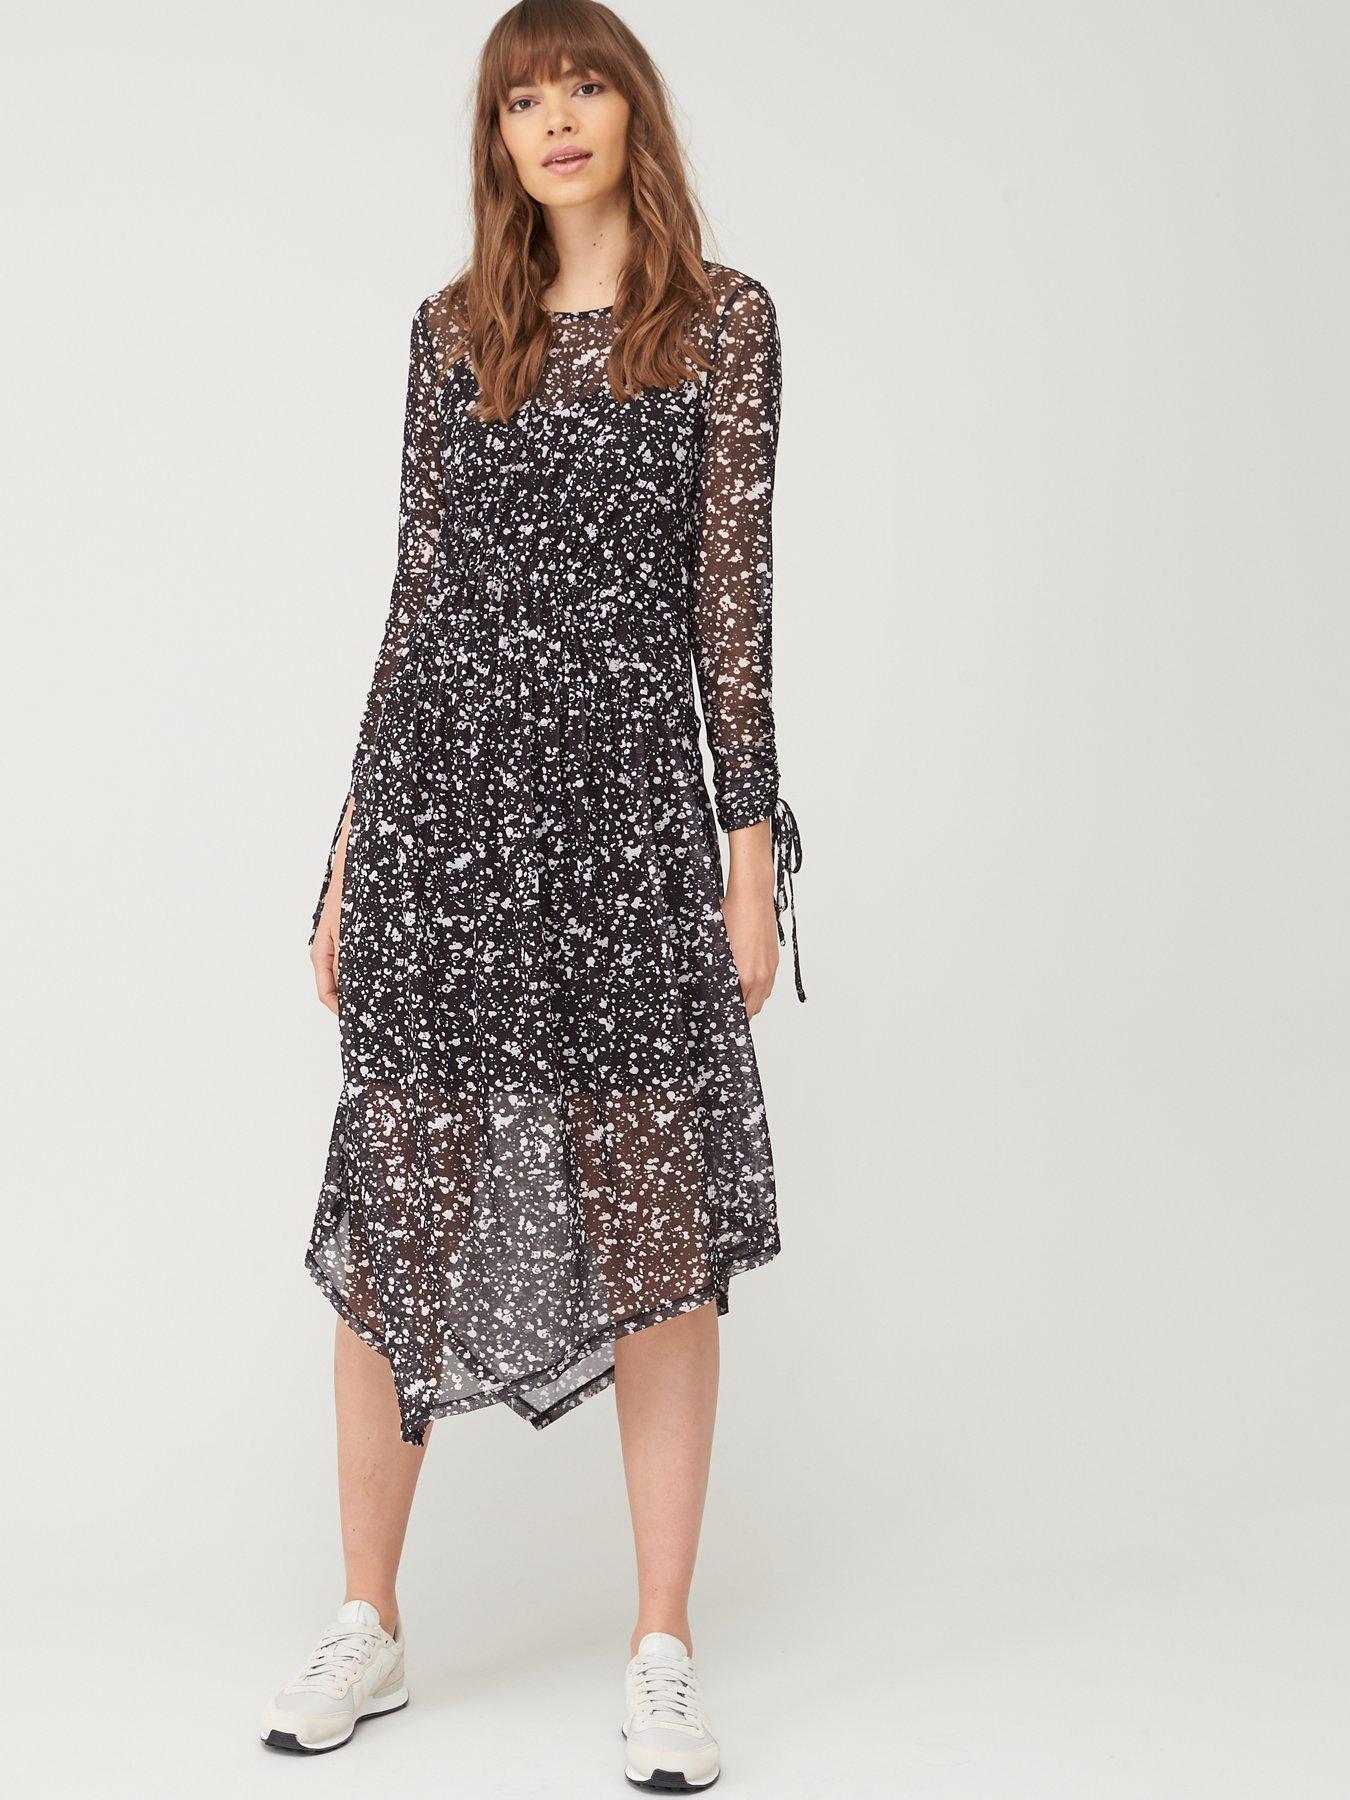 Ex River Island Ladies Black Sheer Mesh Panelled A-Line Dress Size 8 10 12 14 16